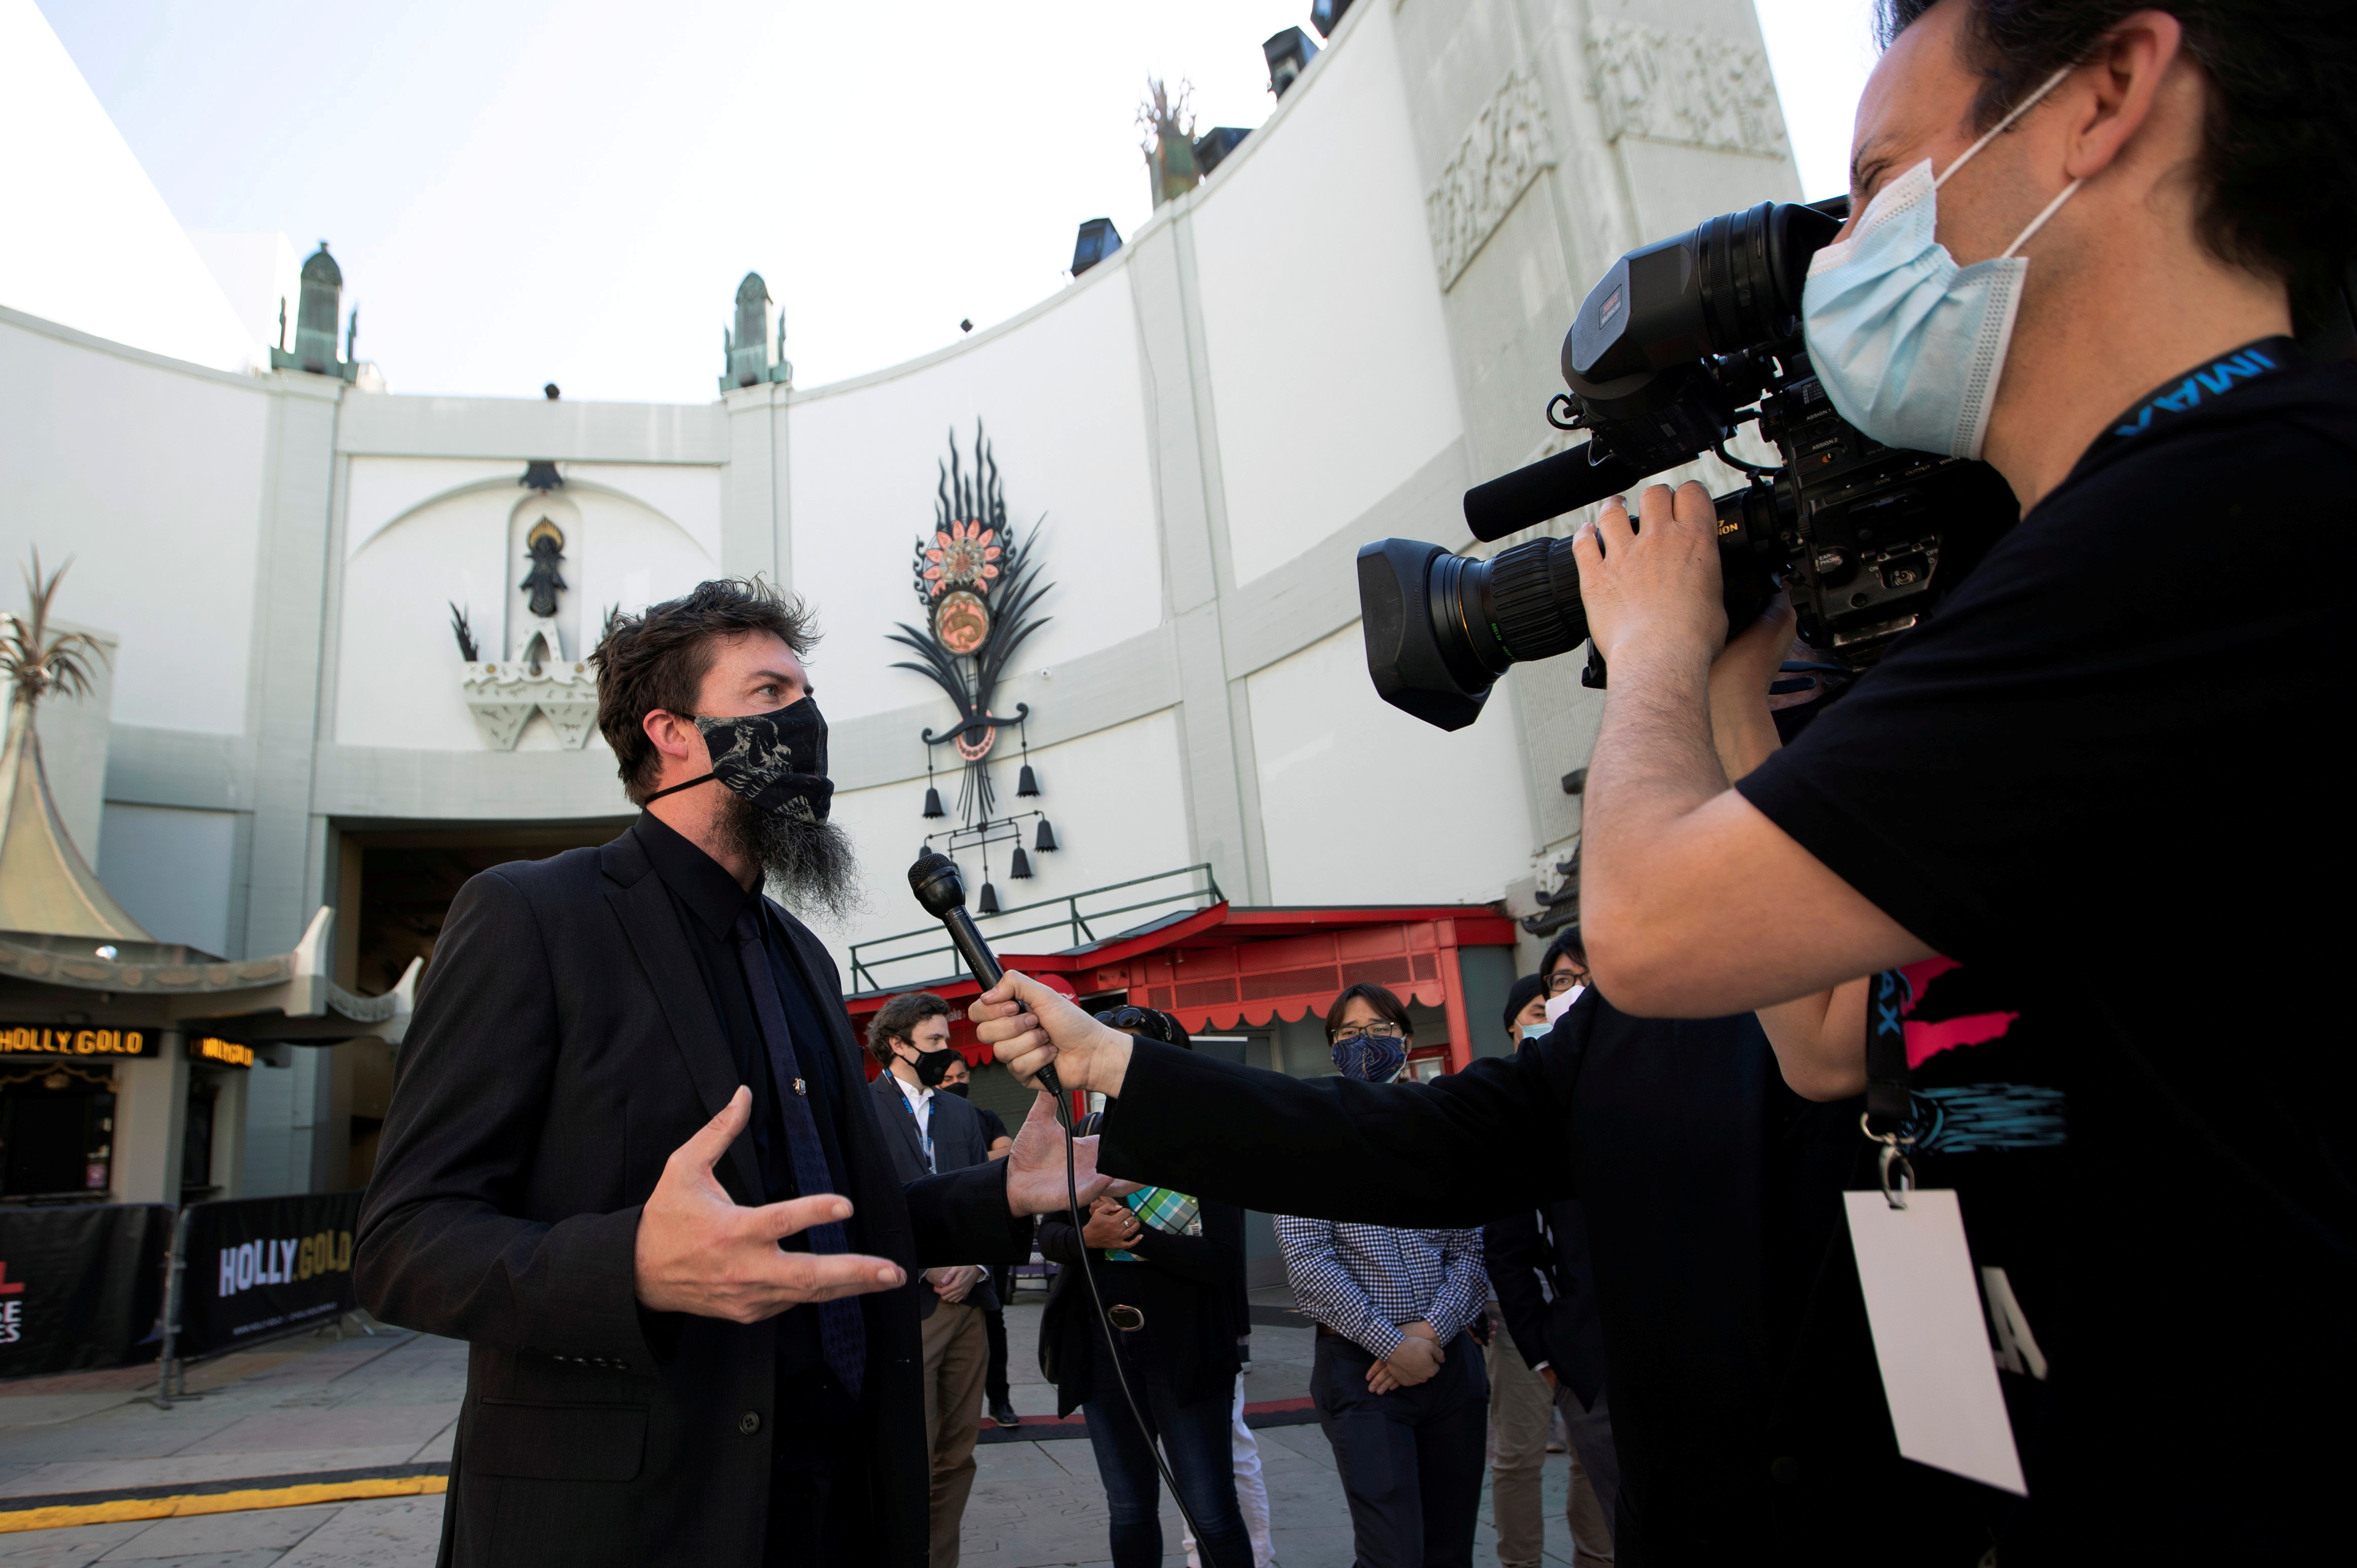 Adam Wingard, director of the upcoming movie